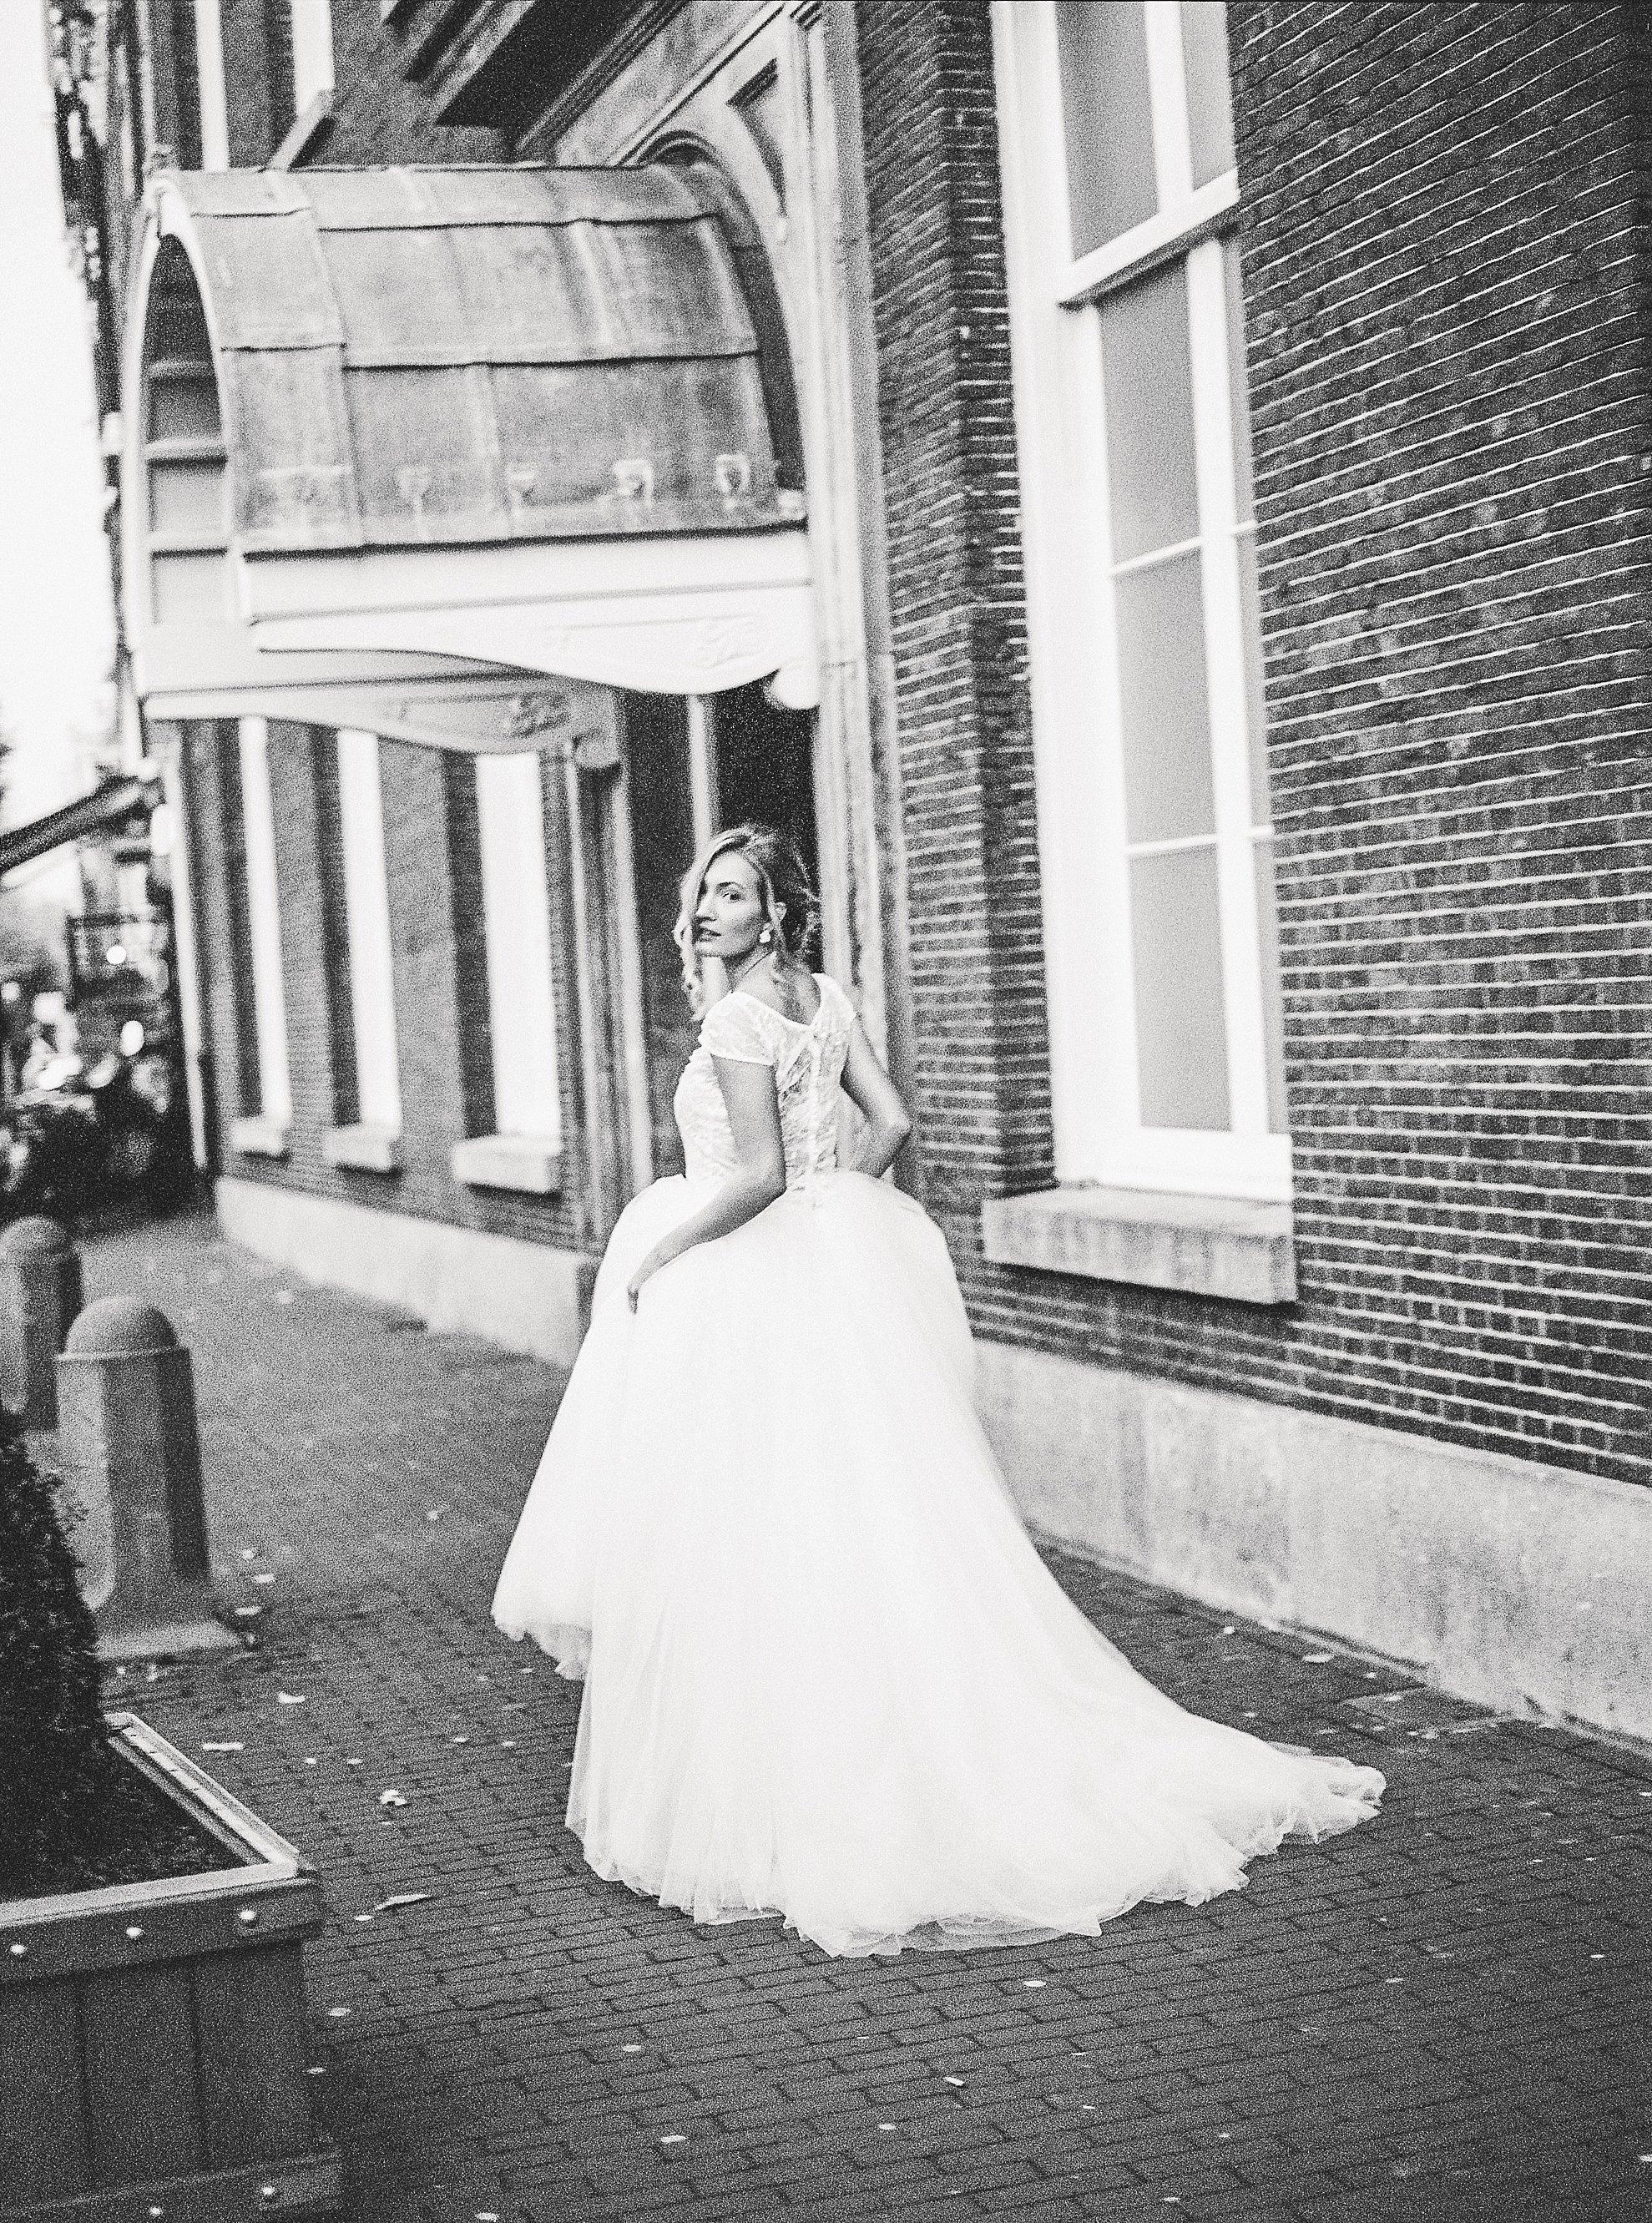 Amanda-Drost-Photography-fotografie-bruiloft-trouwen-winter-TheNetherlands_0084.jpg